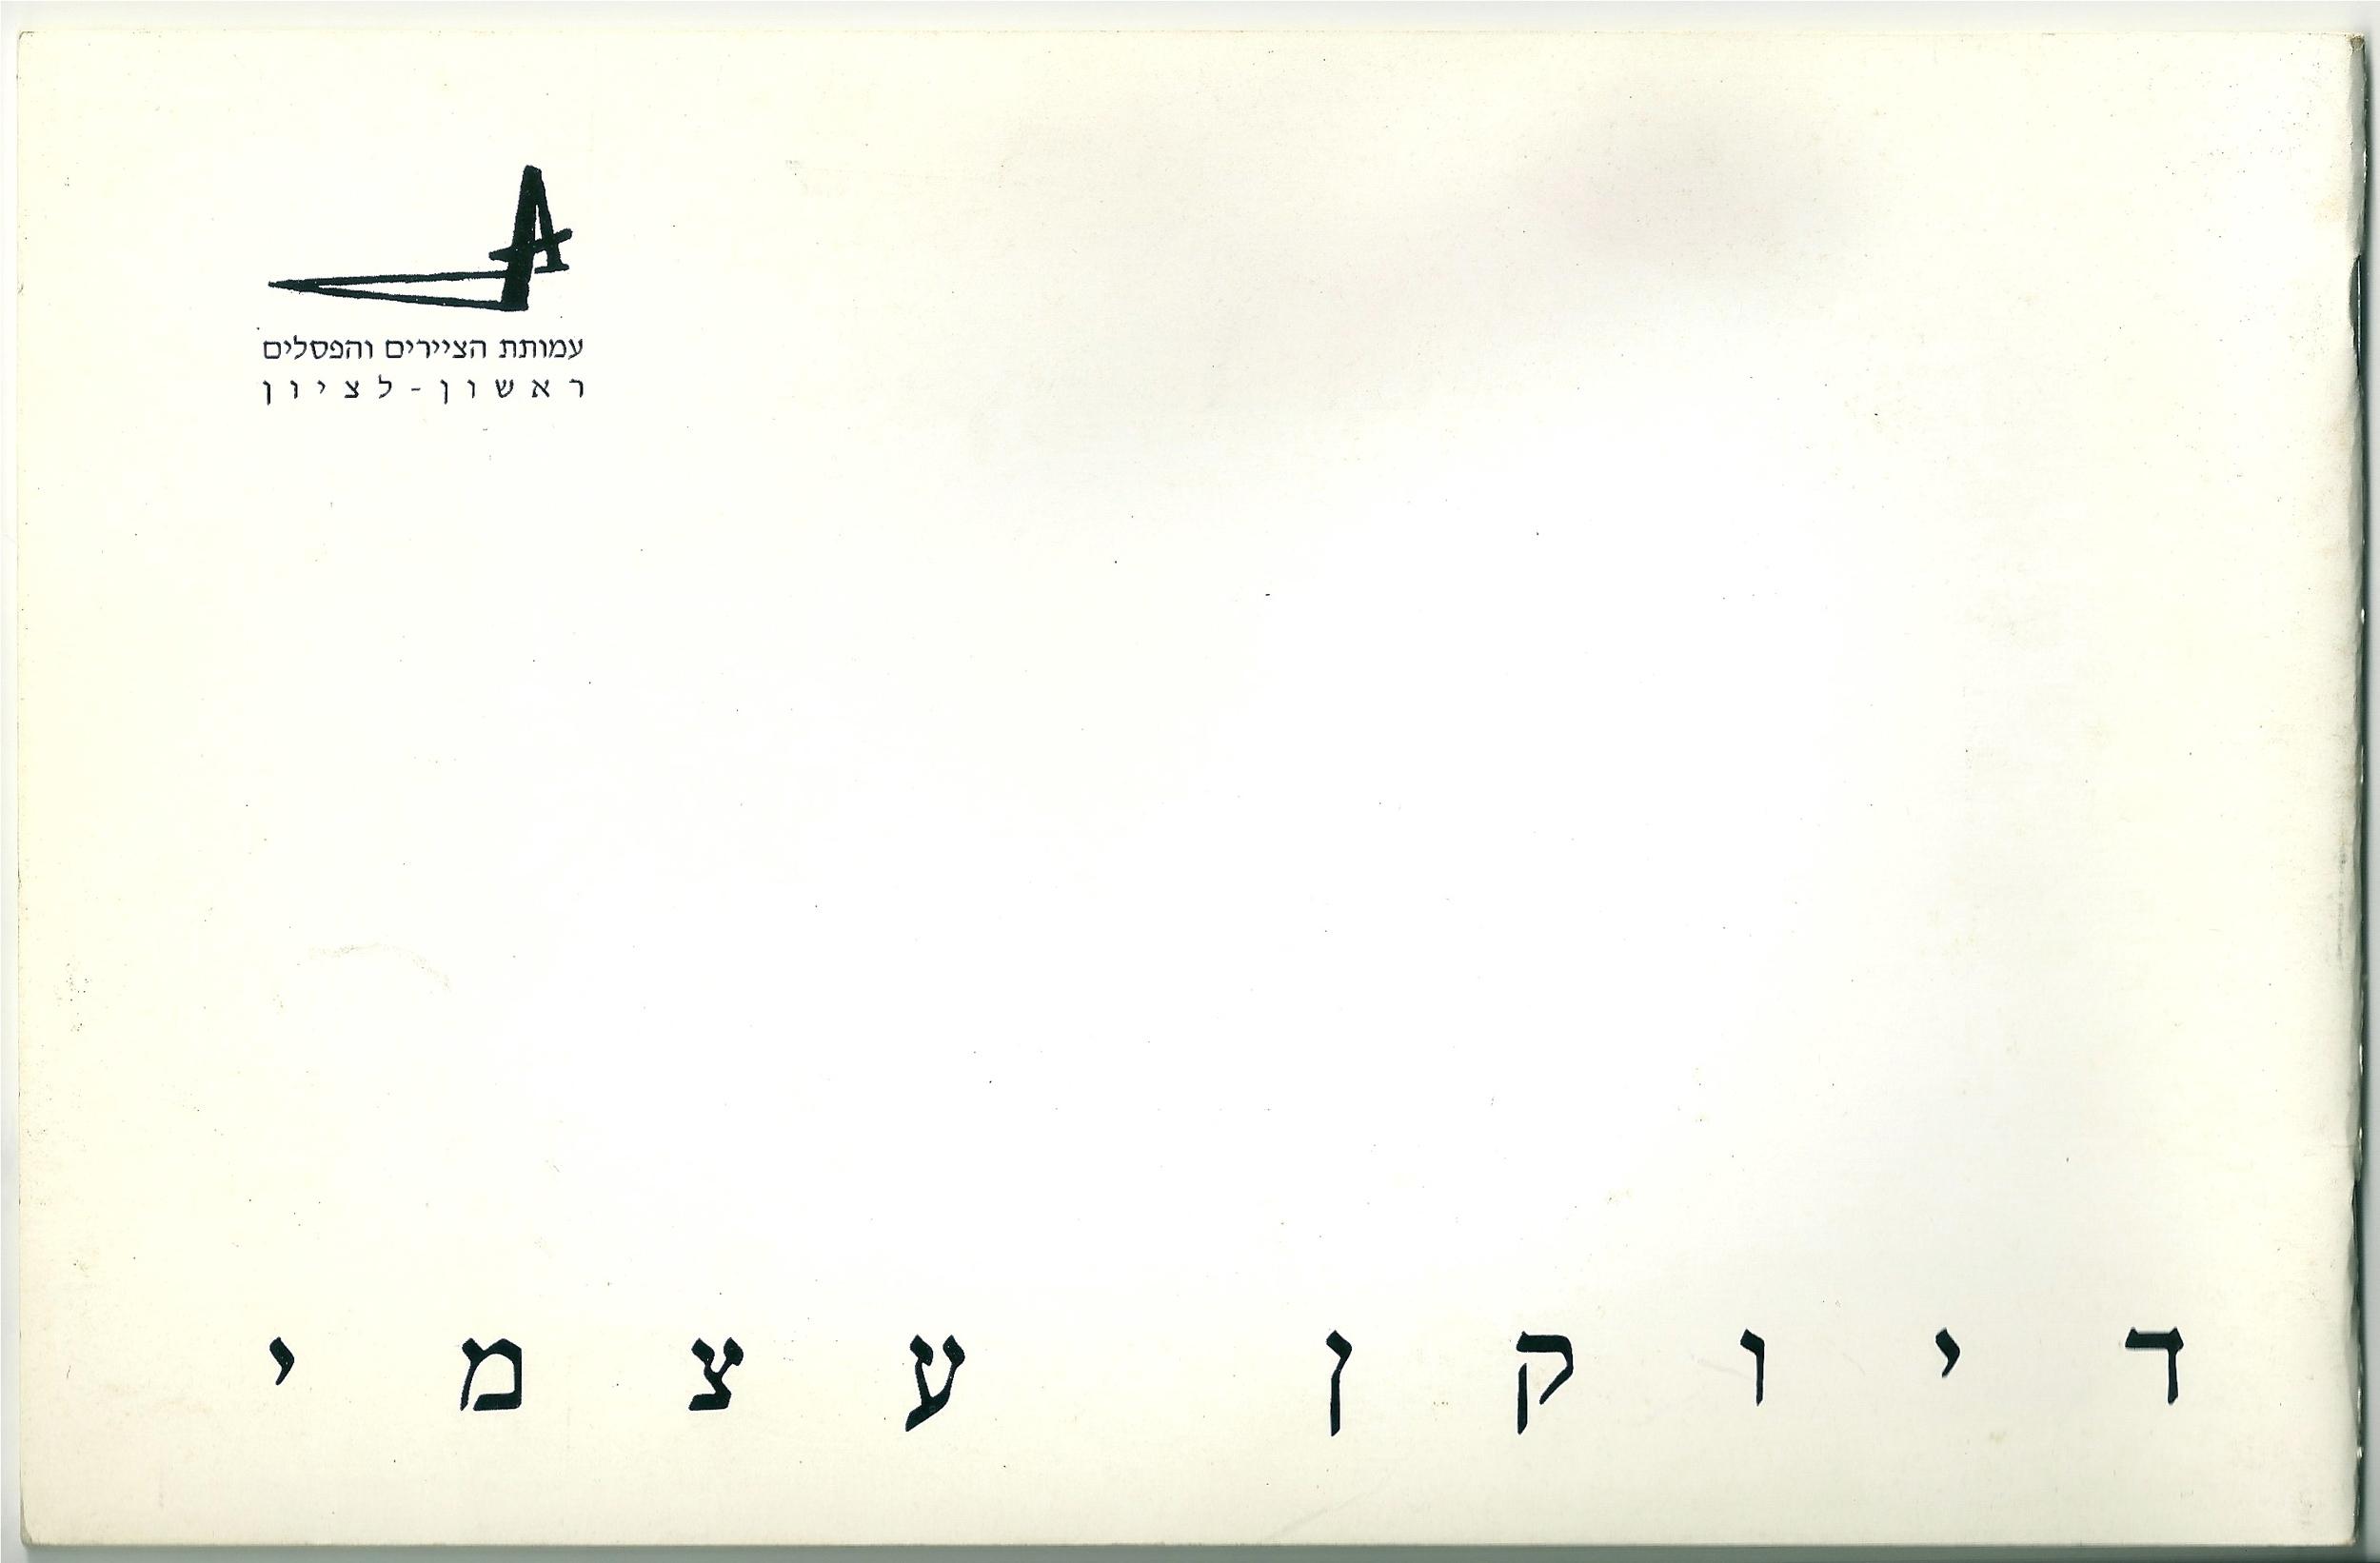 Yaron  29.jpeg